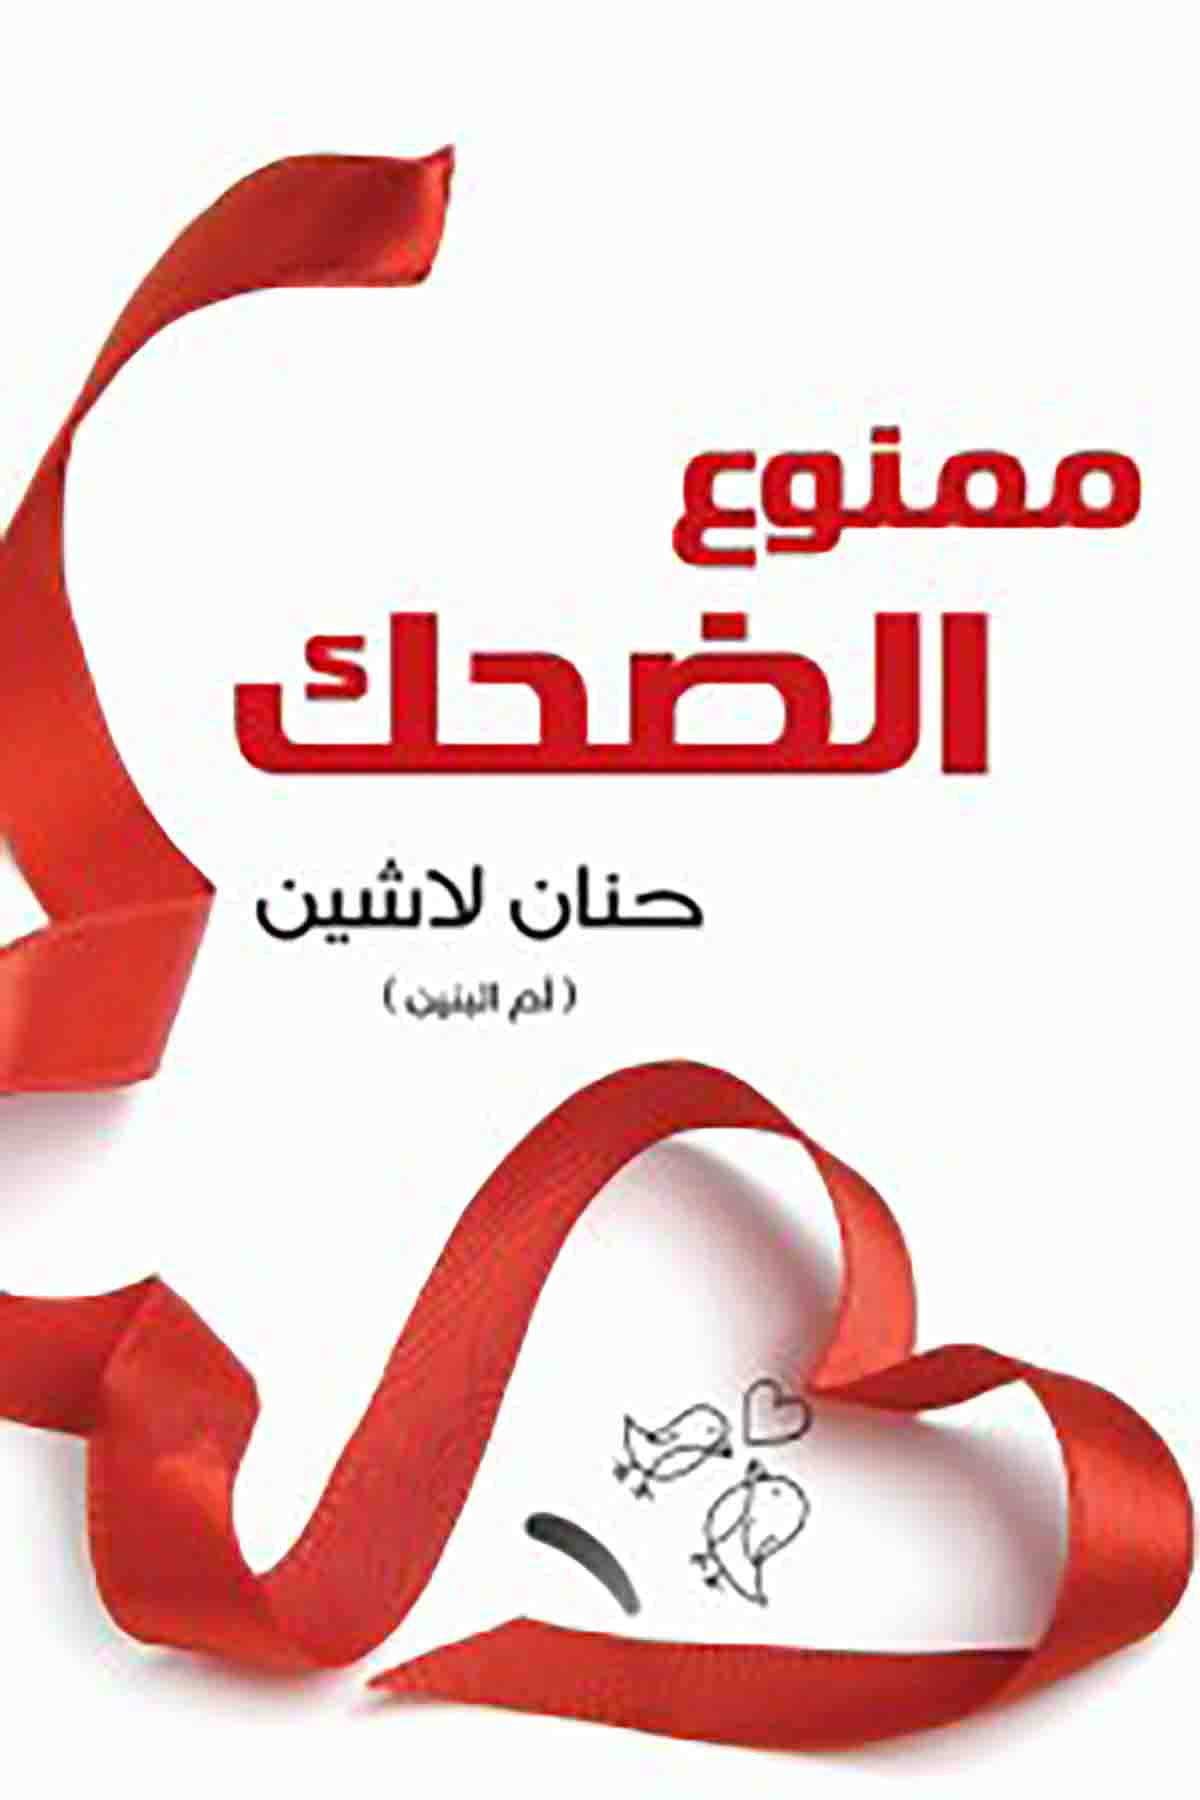 Photo of تحميل كتاب ممنوع الضحك pdf لـ حنان لاشين